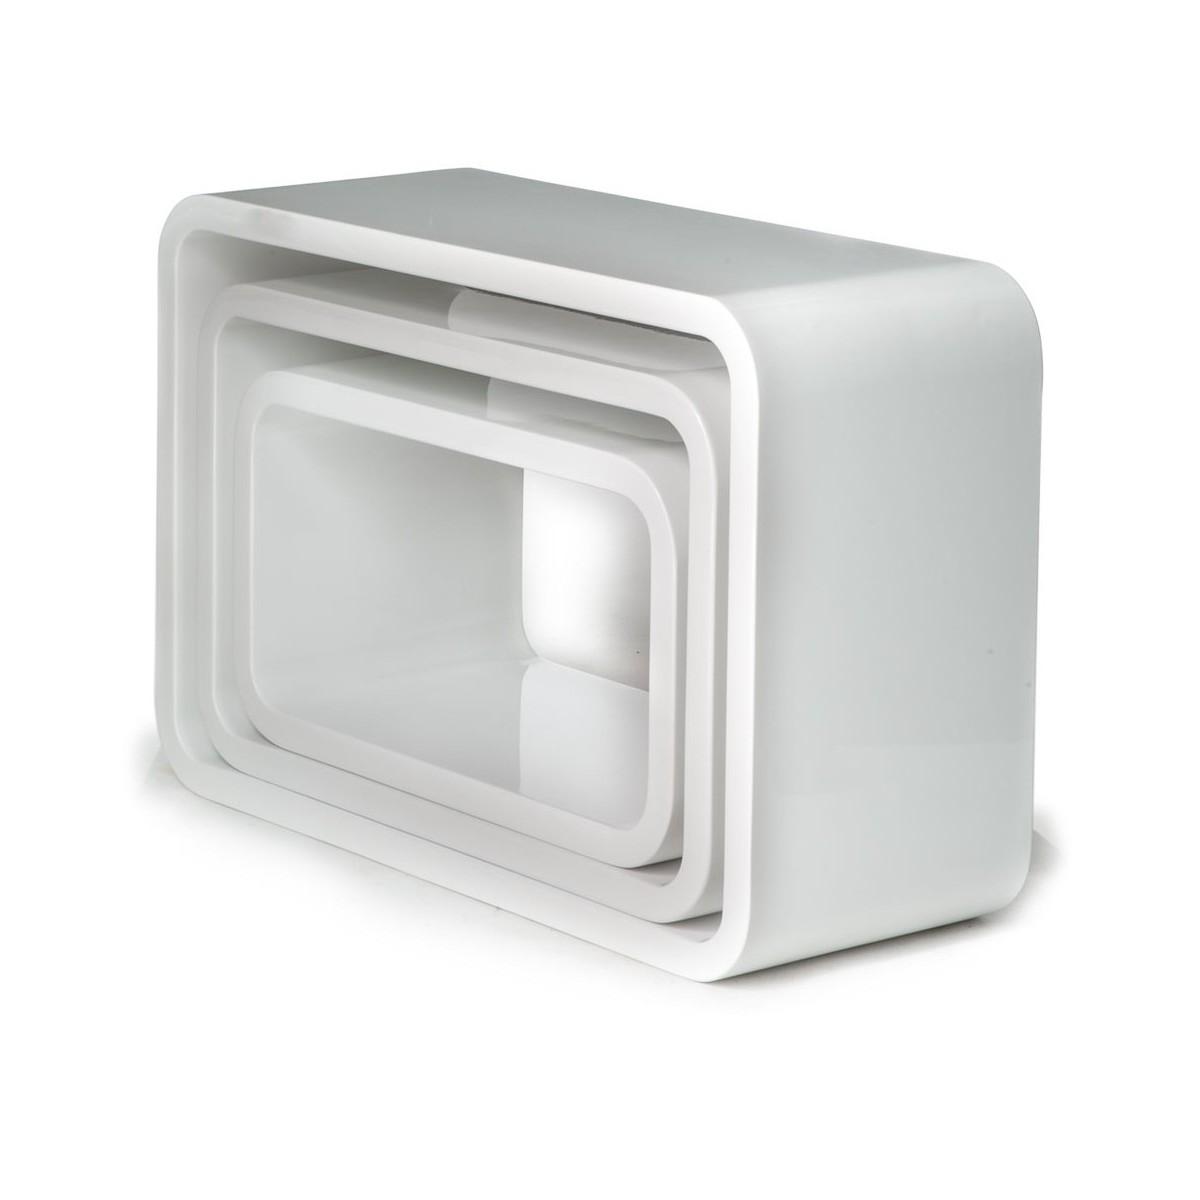 Set 3 cubi kuadra da parete mensole rettangolari per arredo for Cubi in legno per arredare